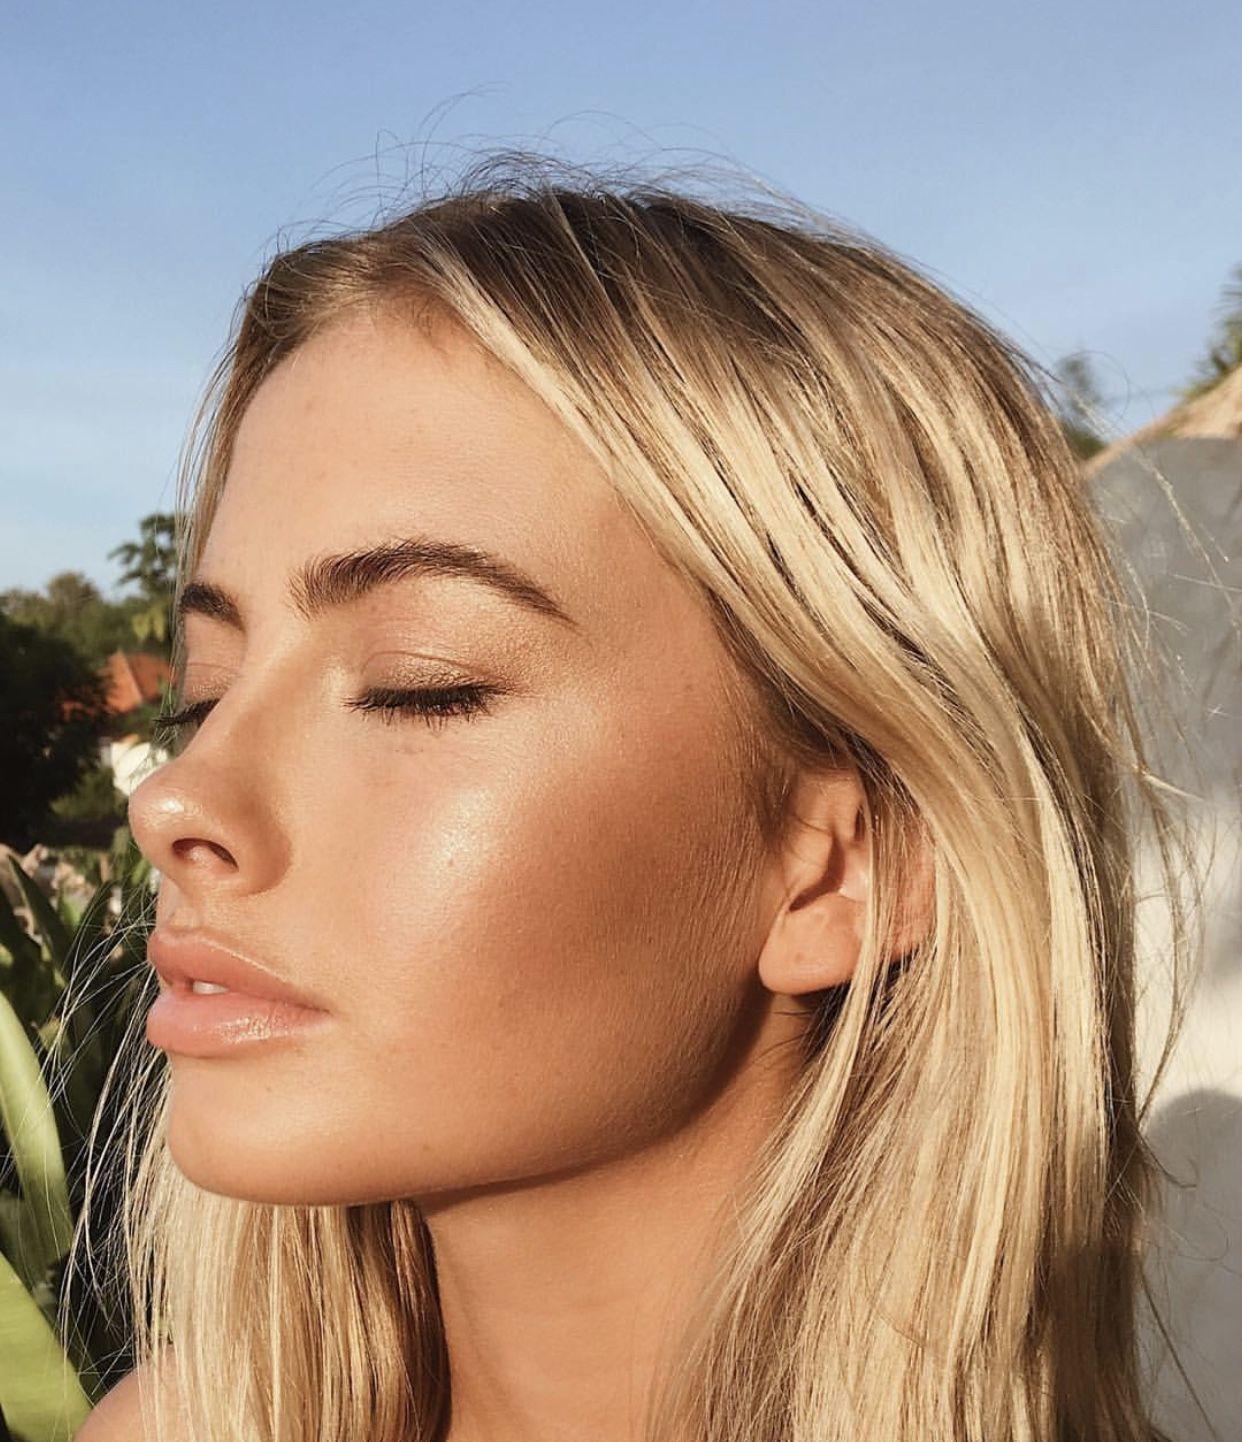 Pin by Autumn Wedan on Eyes Lips Face  Pinterest  Makeup Hair